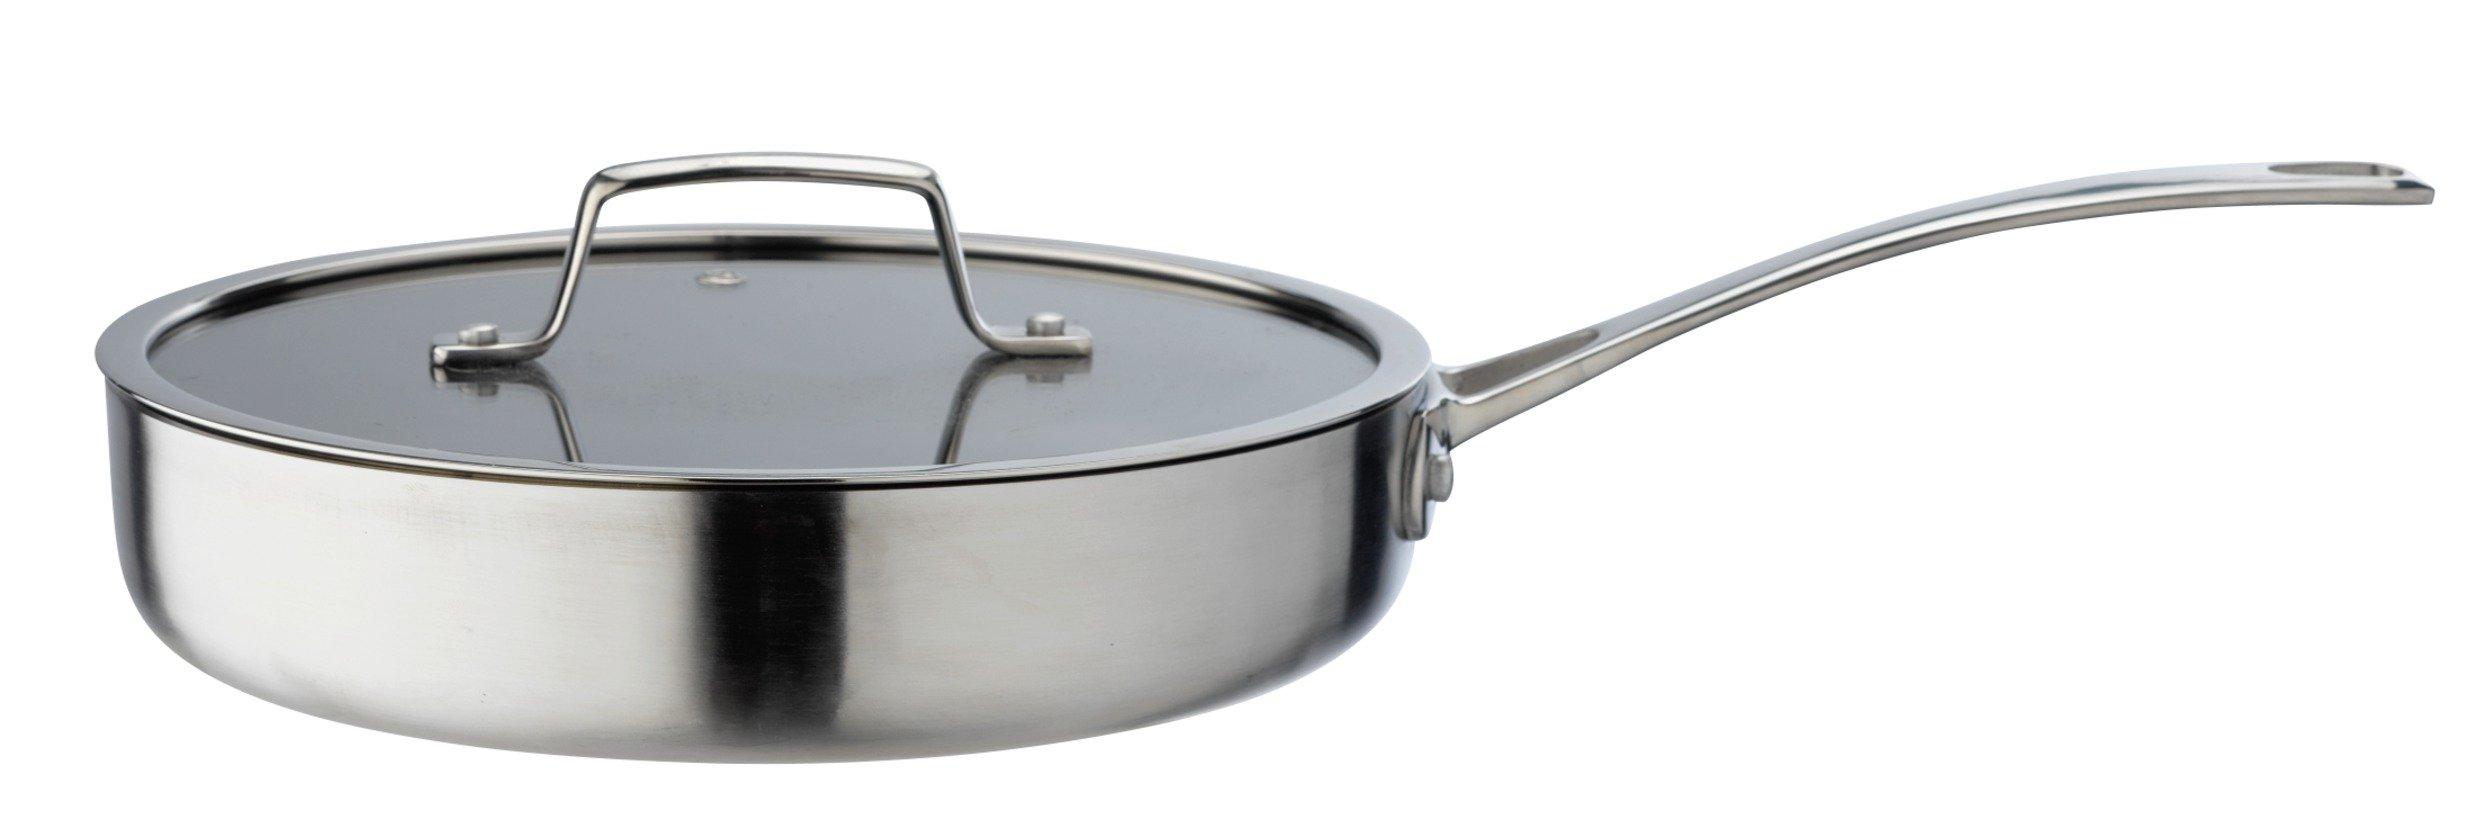 Image of Sainsbury's Home Cooks Collection 24cm Triply Saute Pan